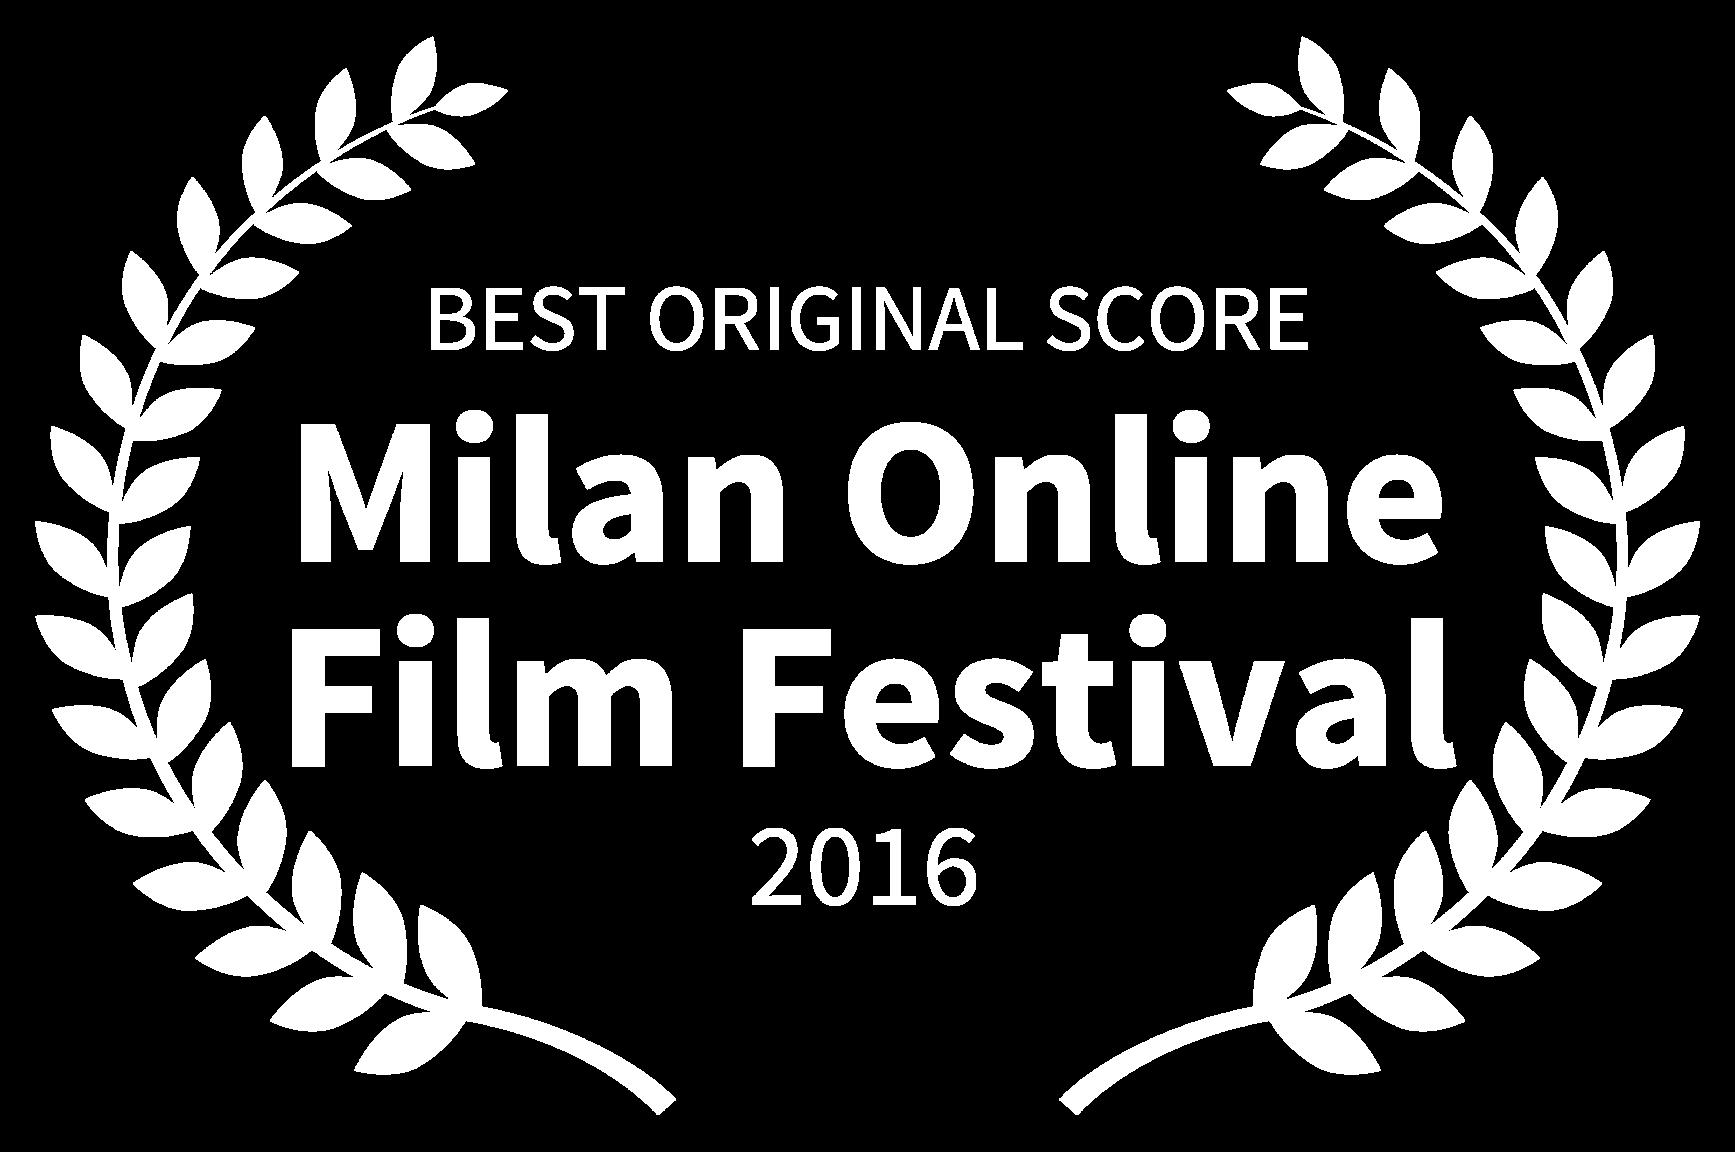 BEST ORIGINAL SCORE - Milan Online Film Festival - 2016